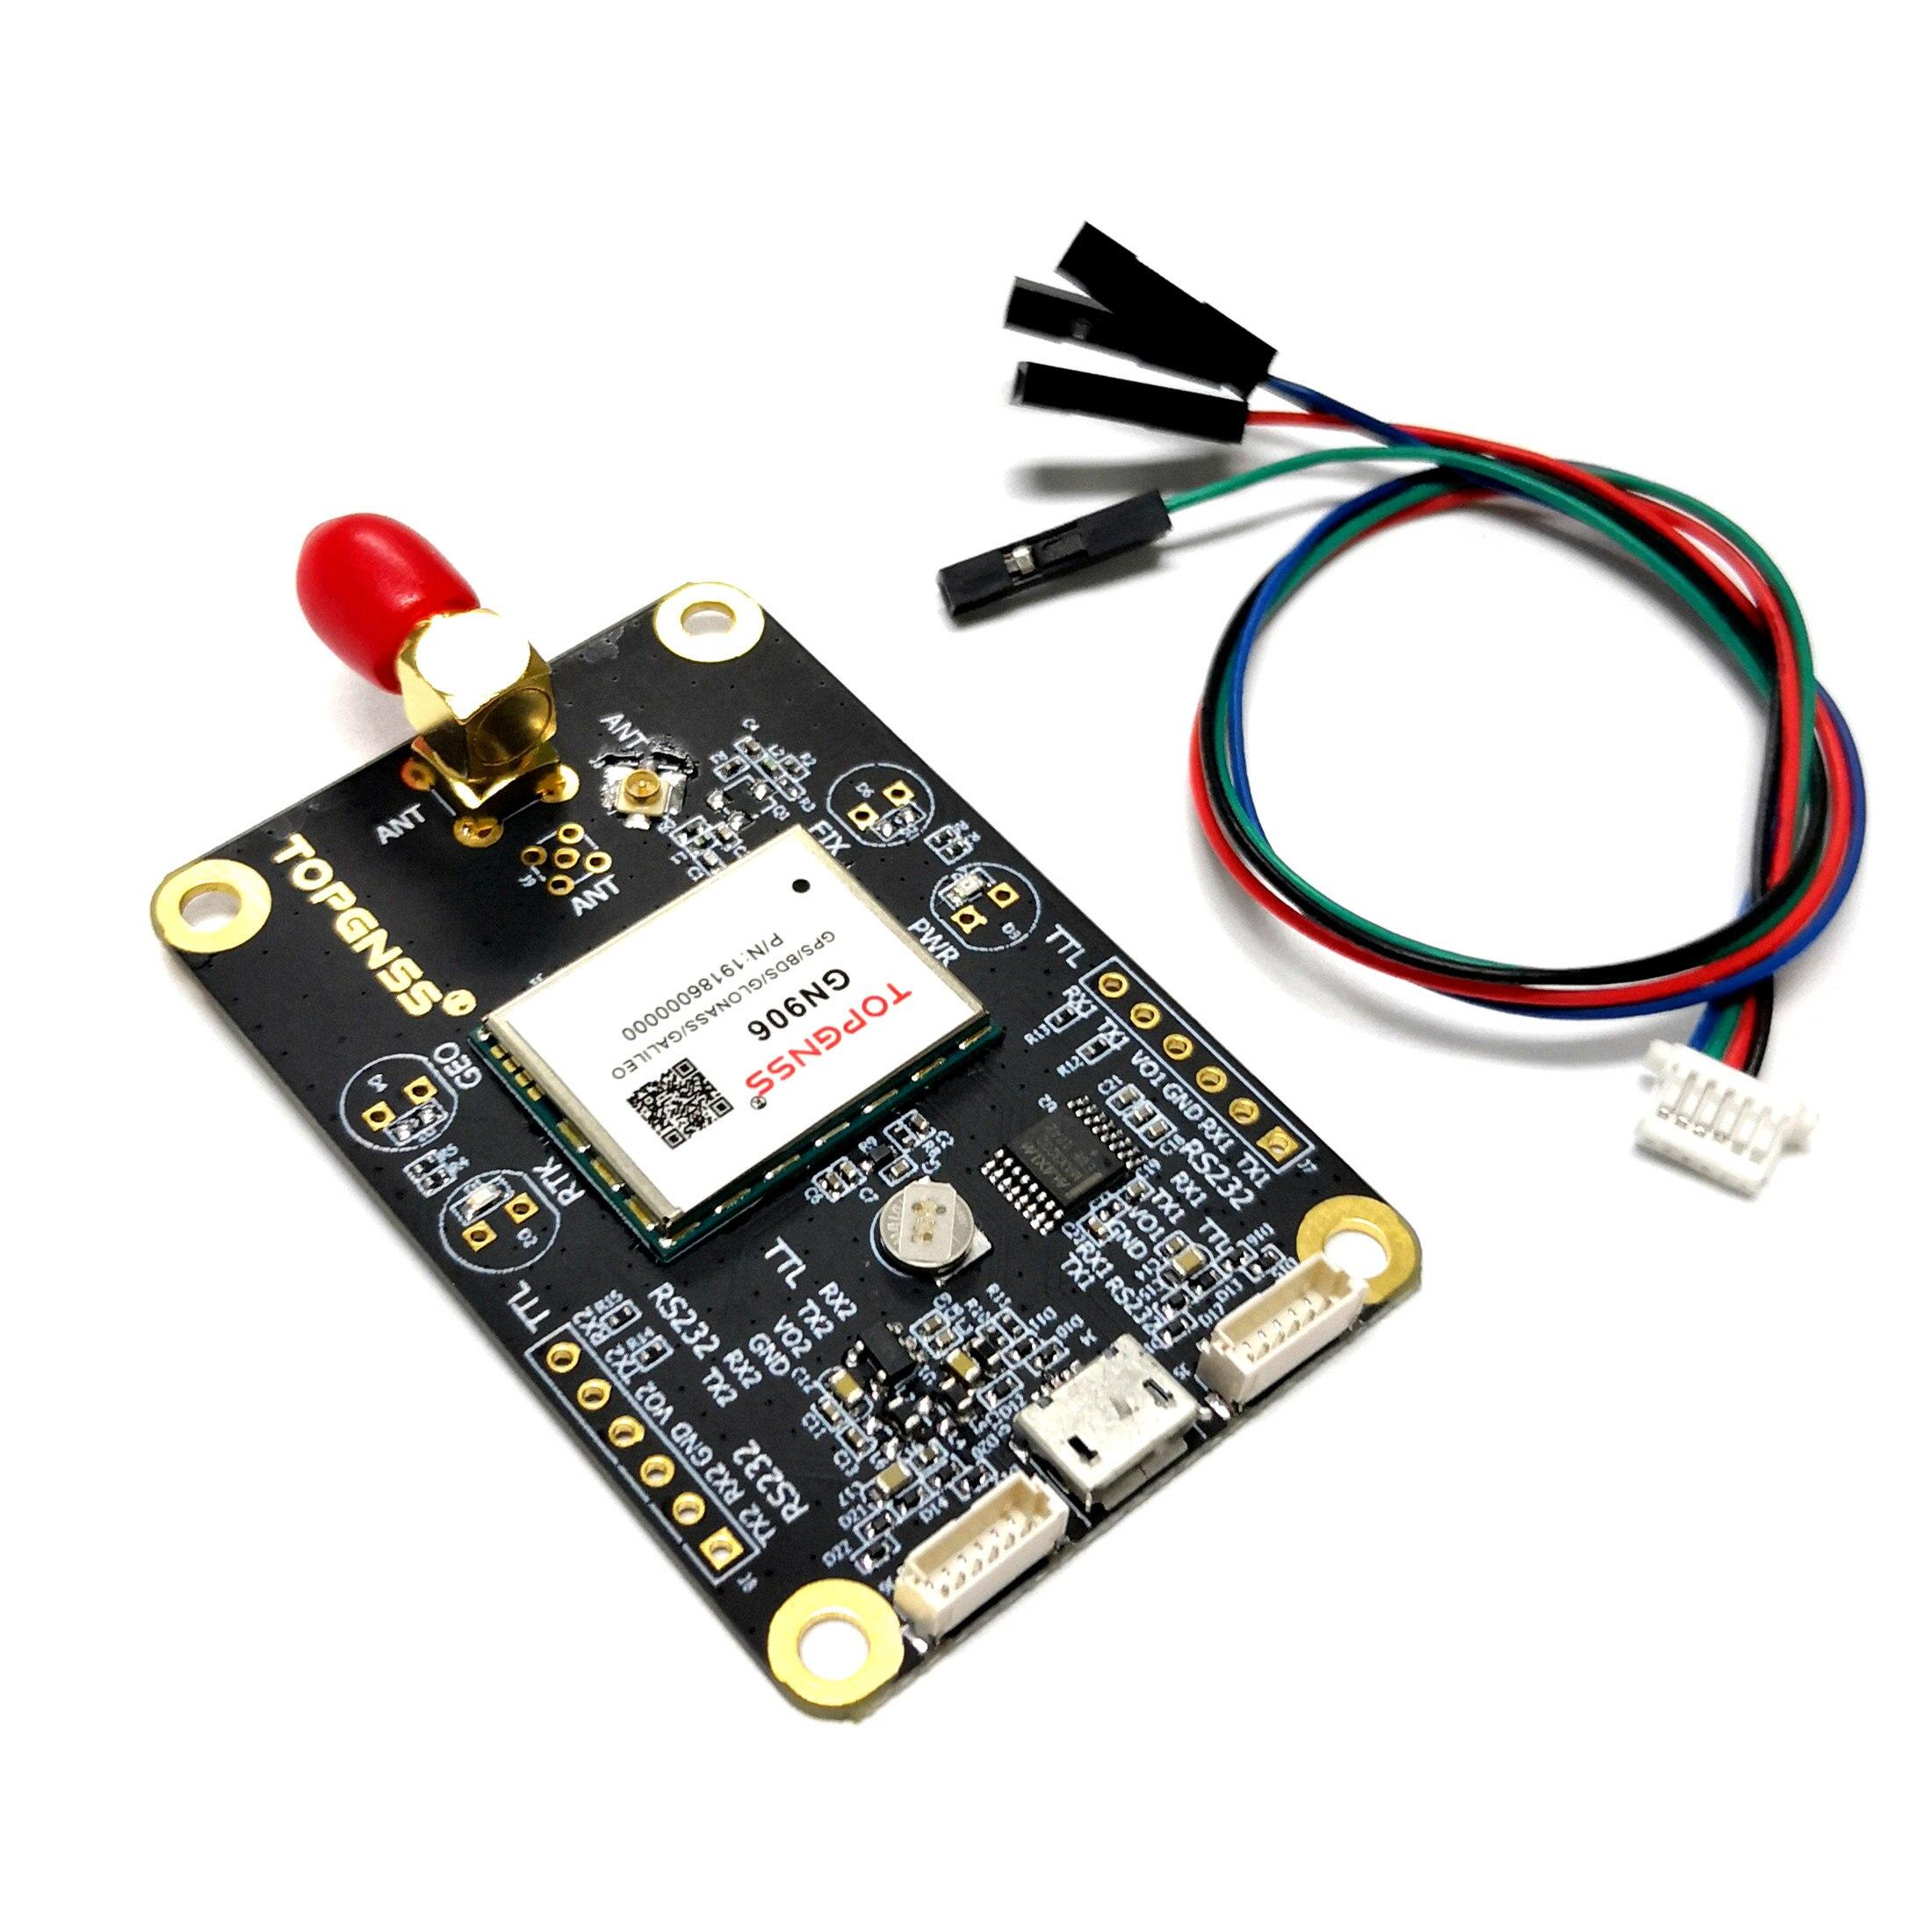 UART Differential Centimeter GPS Module ZED-F9P Module Test Evaluation Board NMEA0183 Supports Chihiro